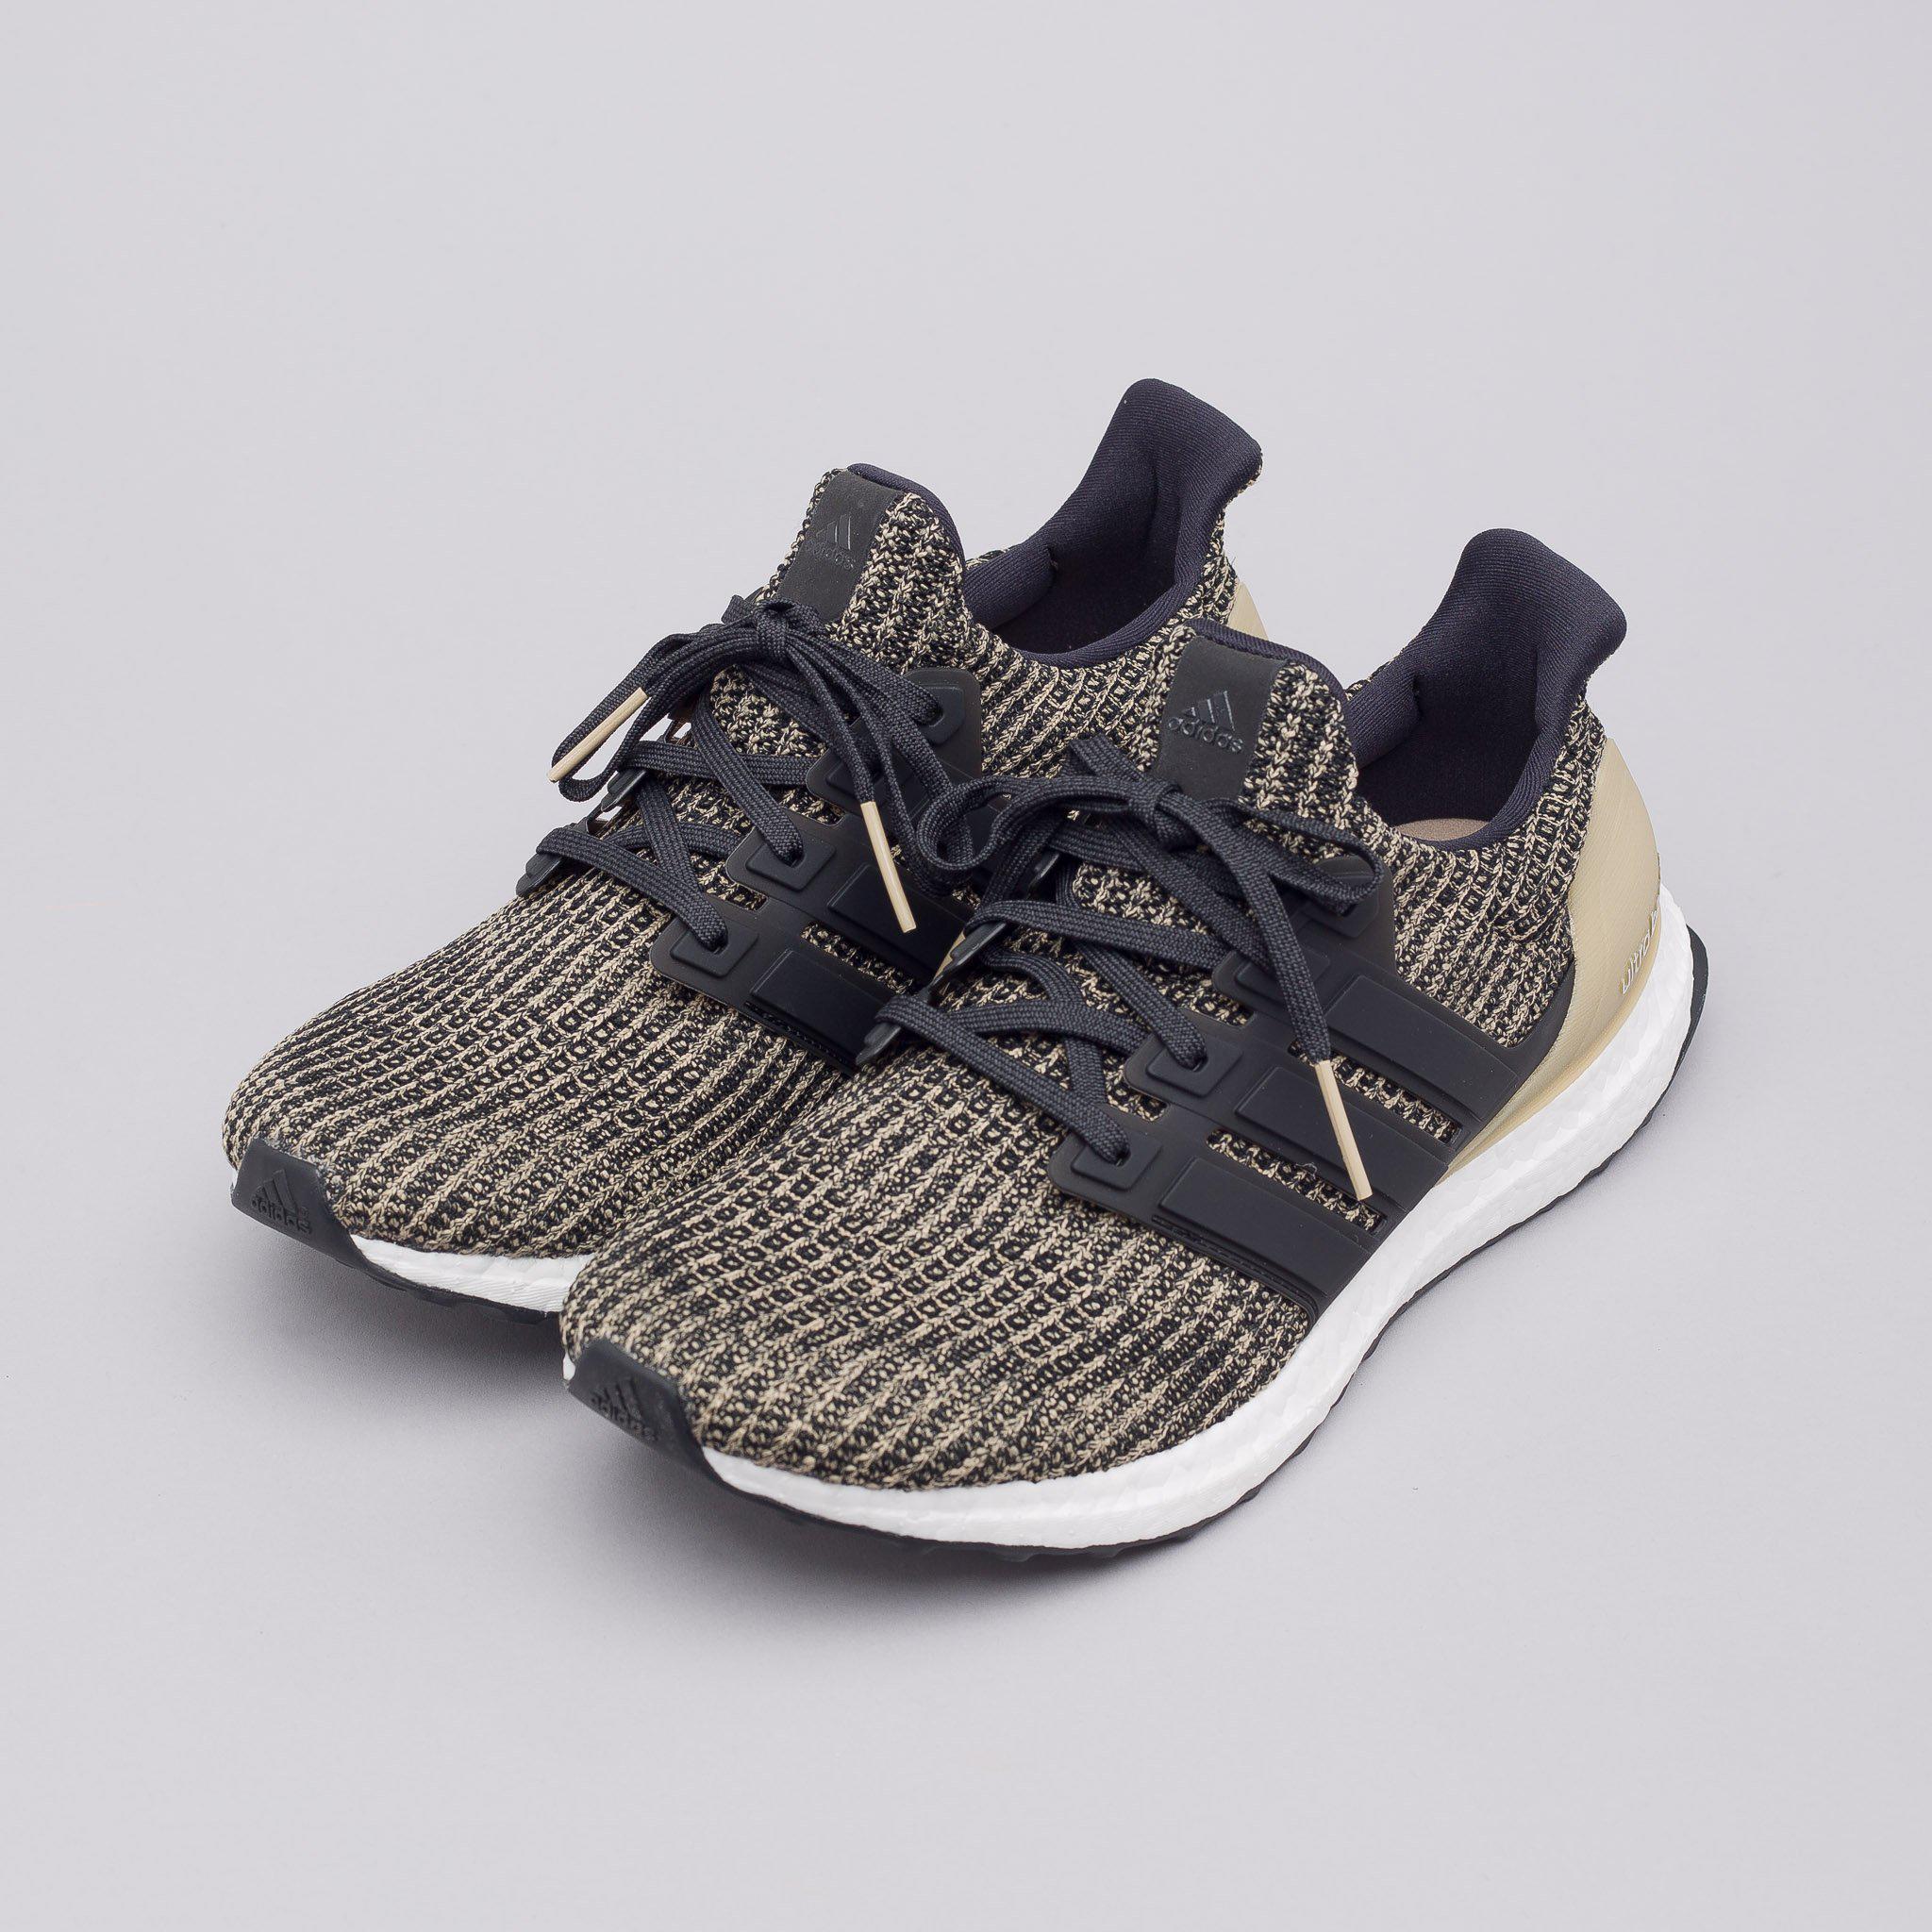 a62940479c2 ... lyst adidas originals ultraboost 4.0 in core black dark mocha in